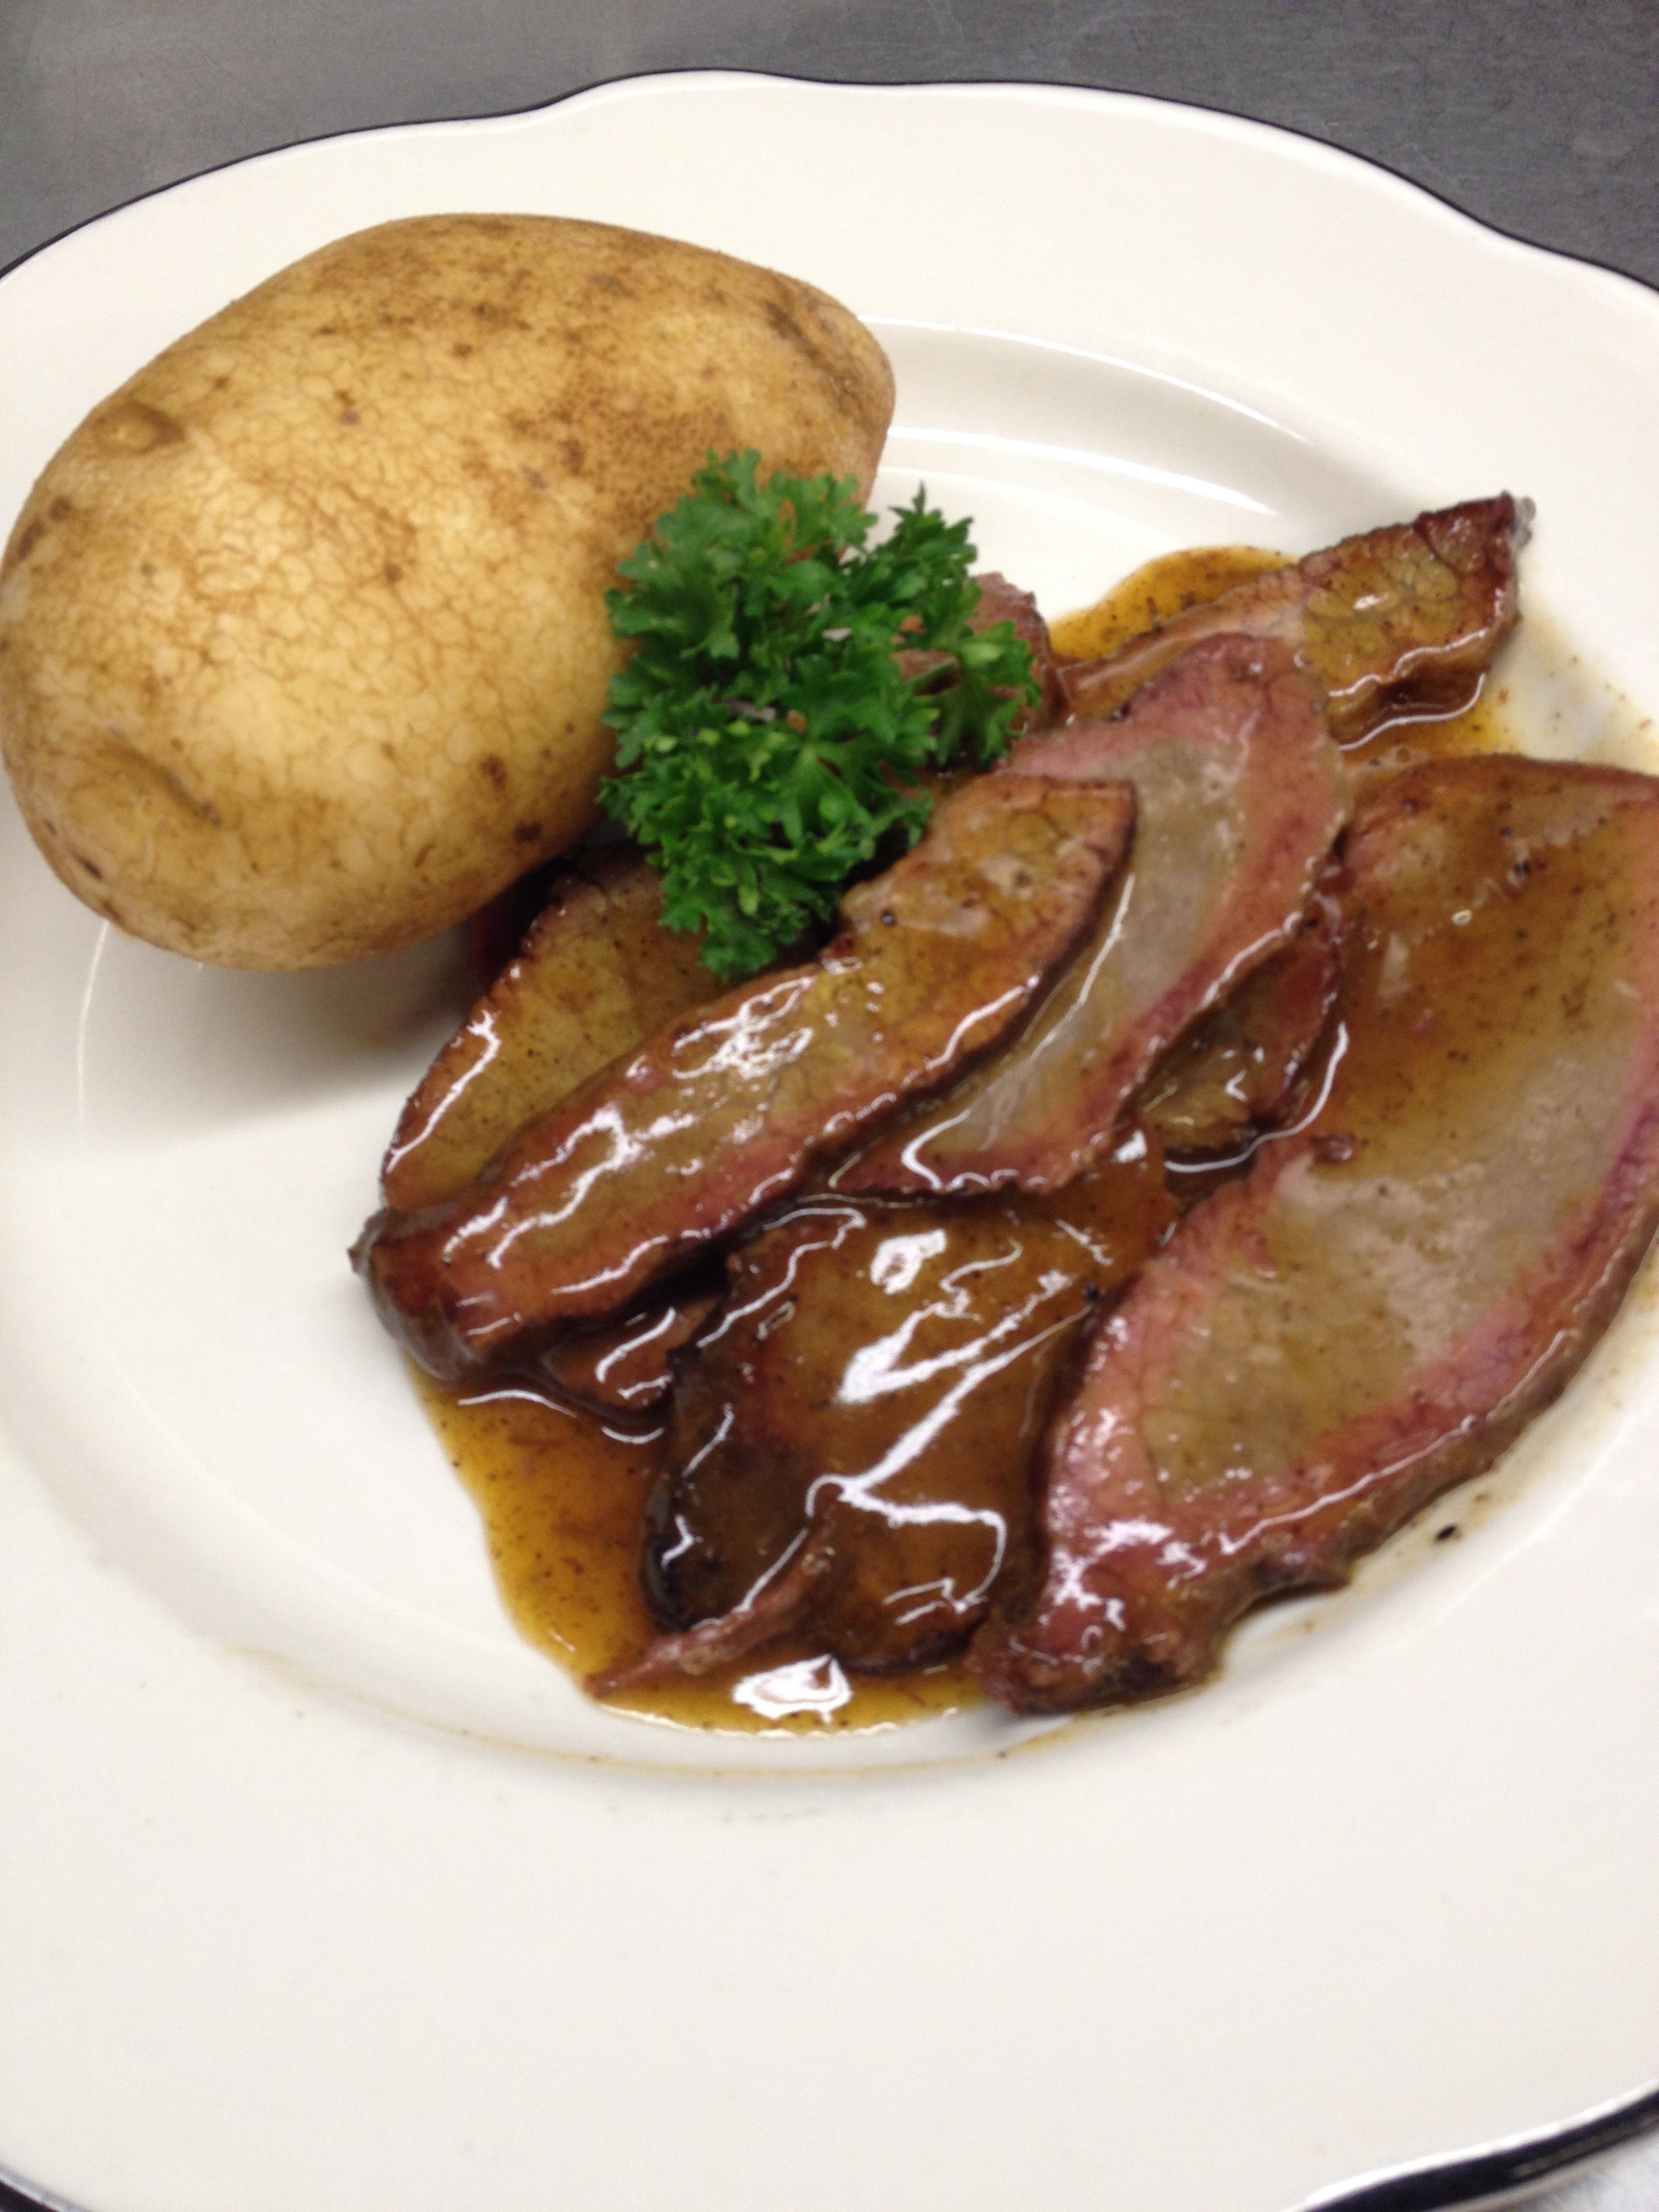 brisket-with-baked-potato.jpg